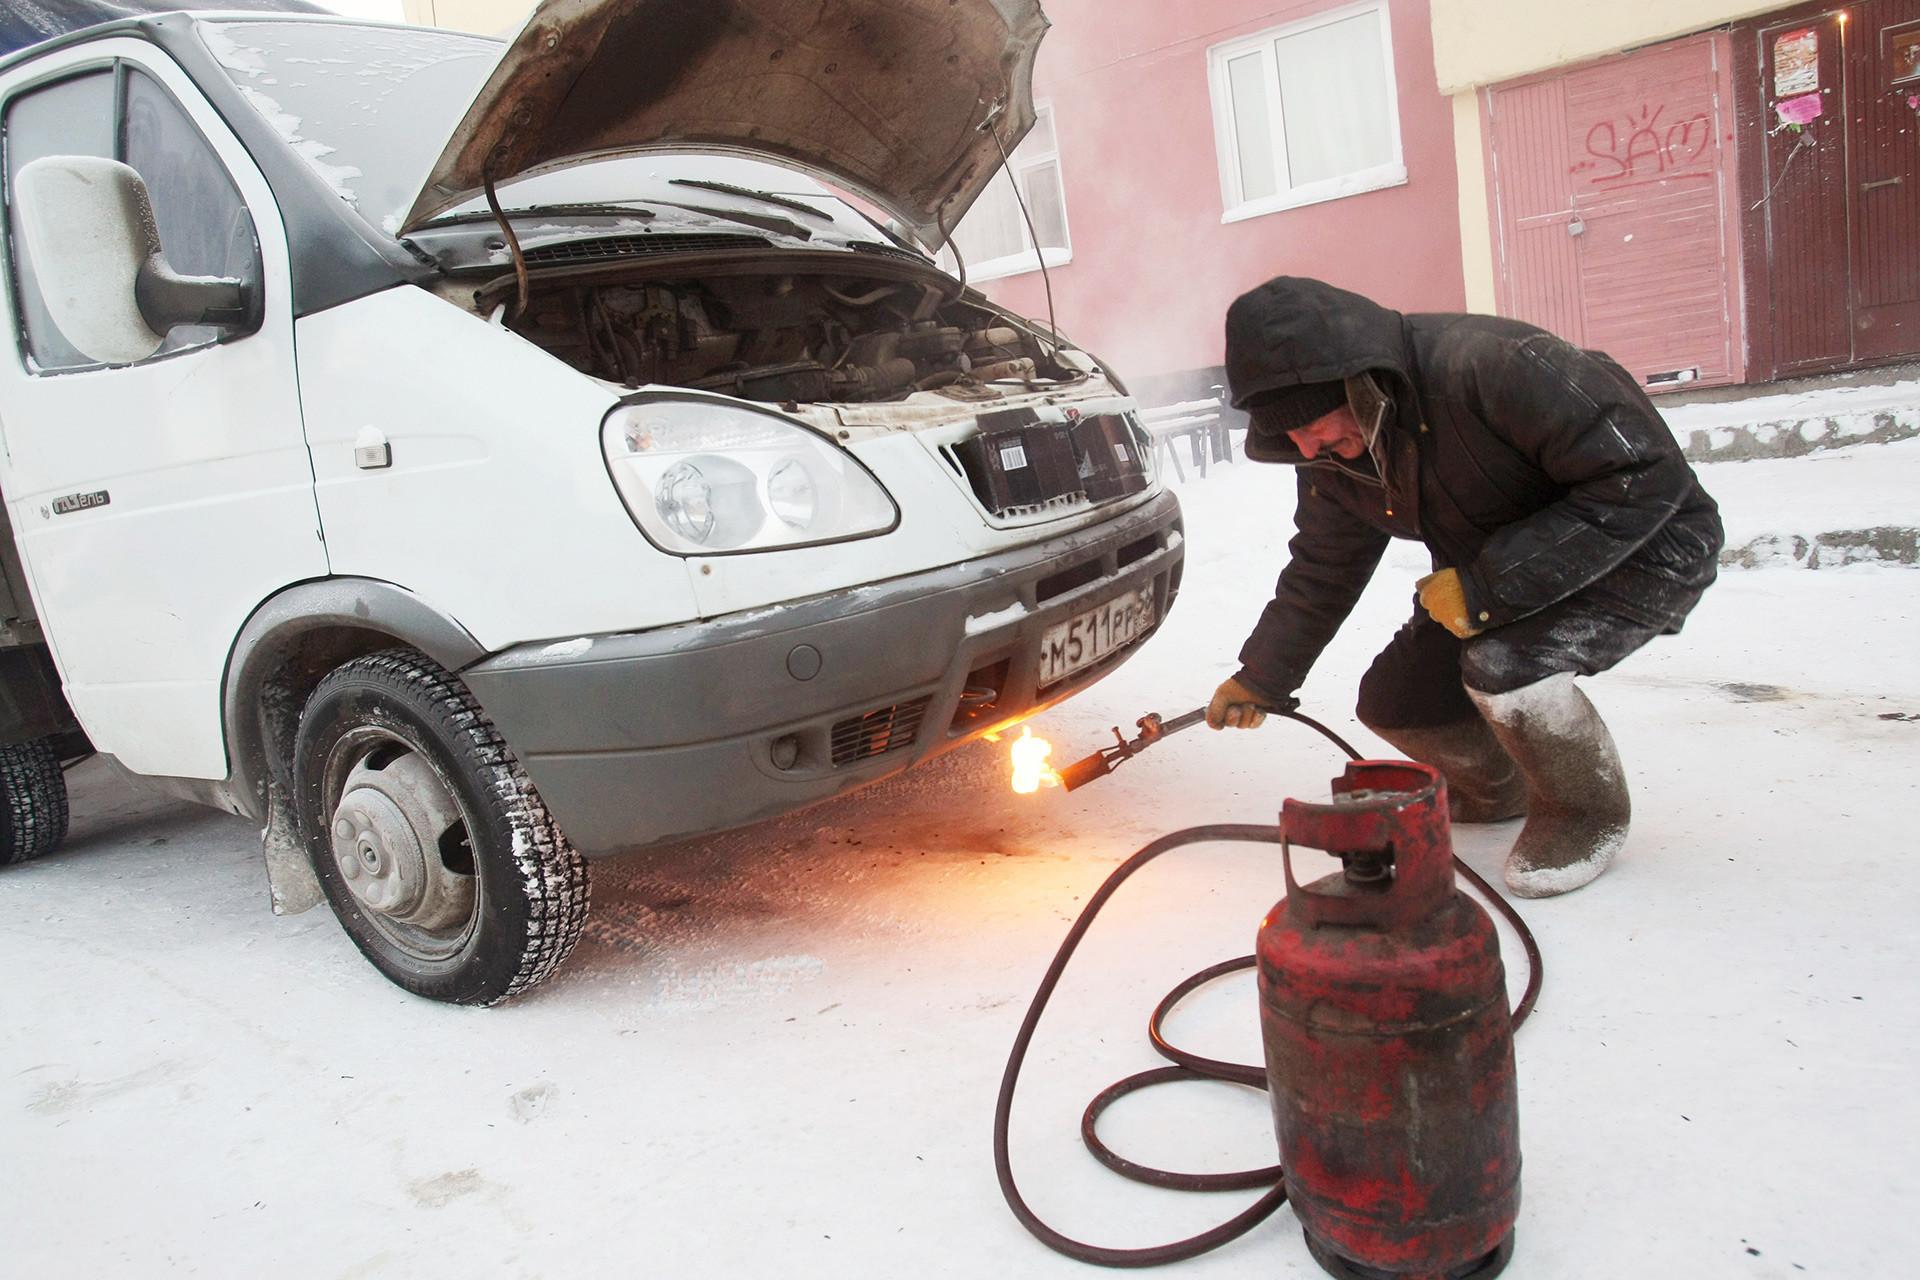 Minus 30 derajat celcius di Novy Urengoi. Desember 2007.